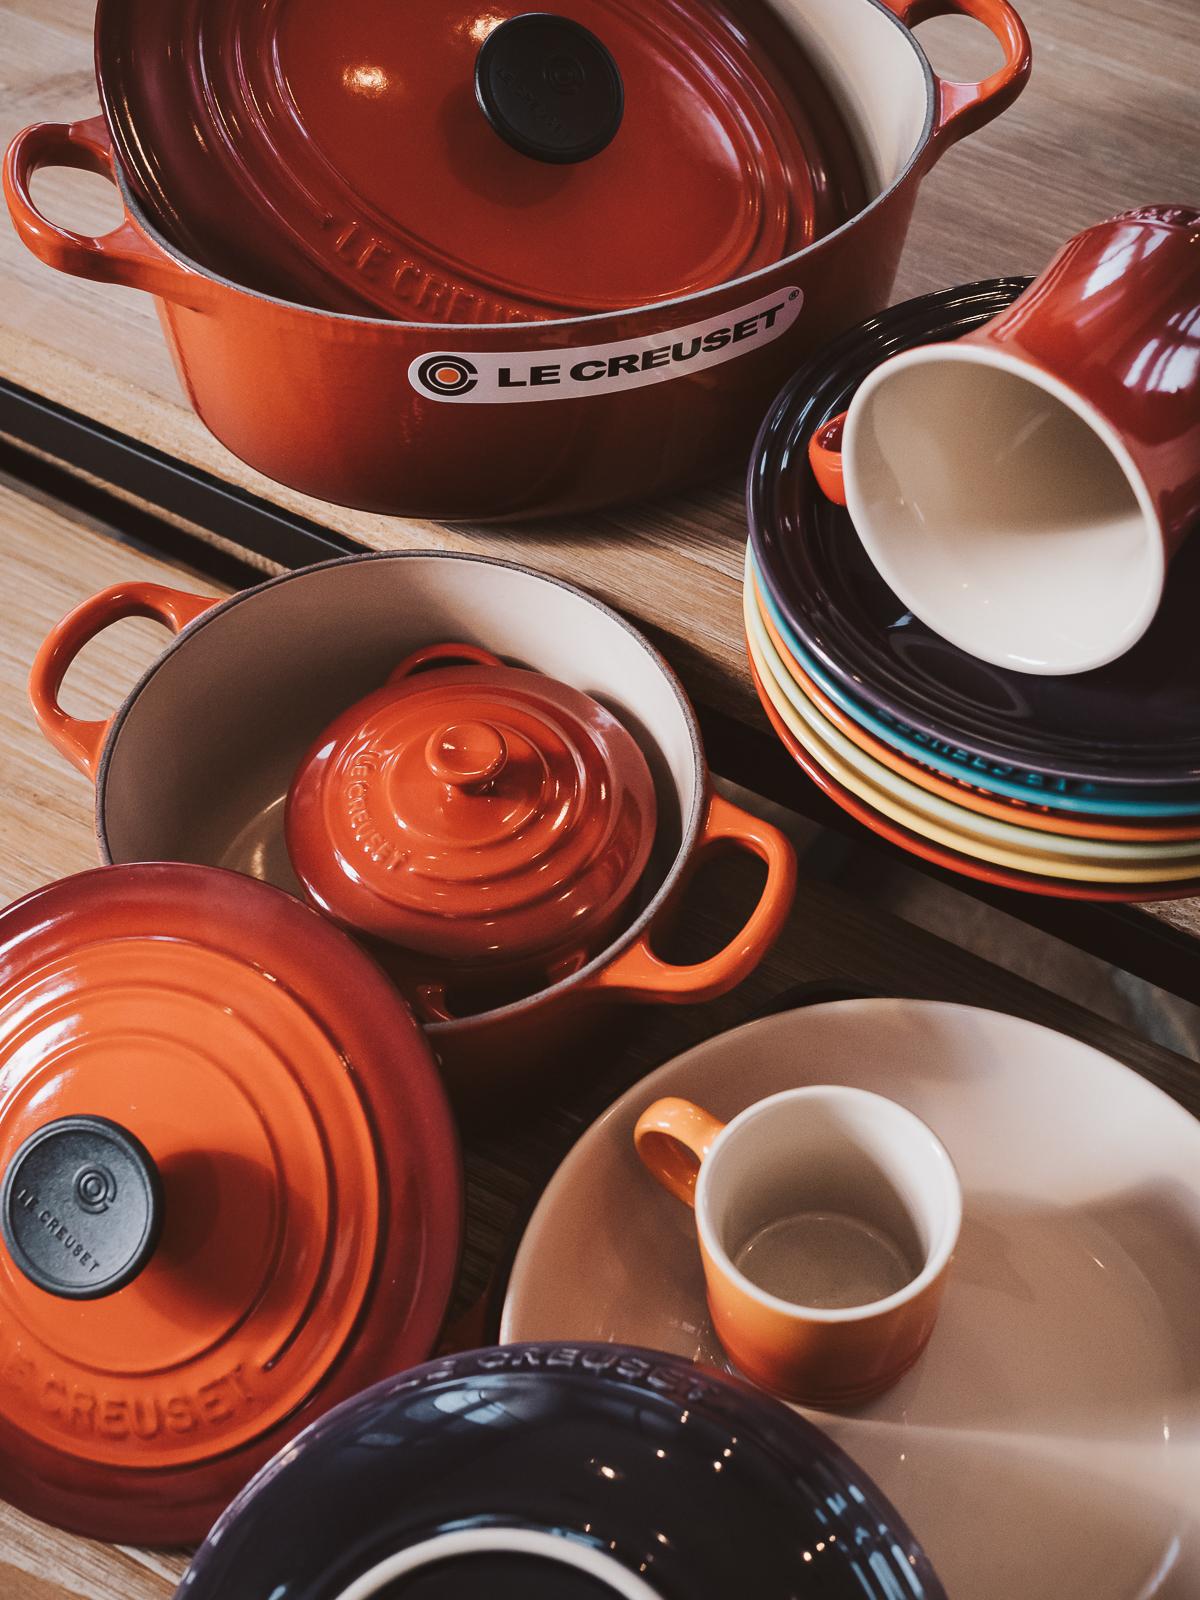 Ingolstadt Village Chinese New Year Lifestyle Shopping & Home Cooking - Olympus EM1Markii 2512 - Yes! Please Enjoy by Fanning Tseng-54.jpg